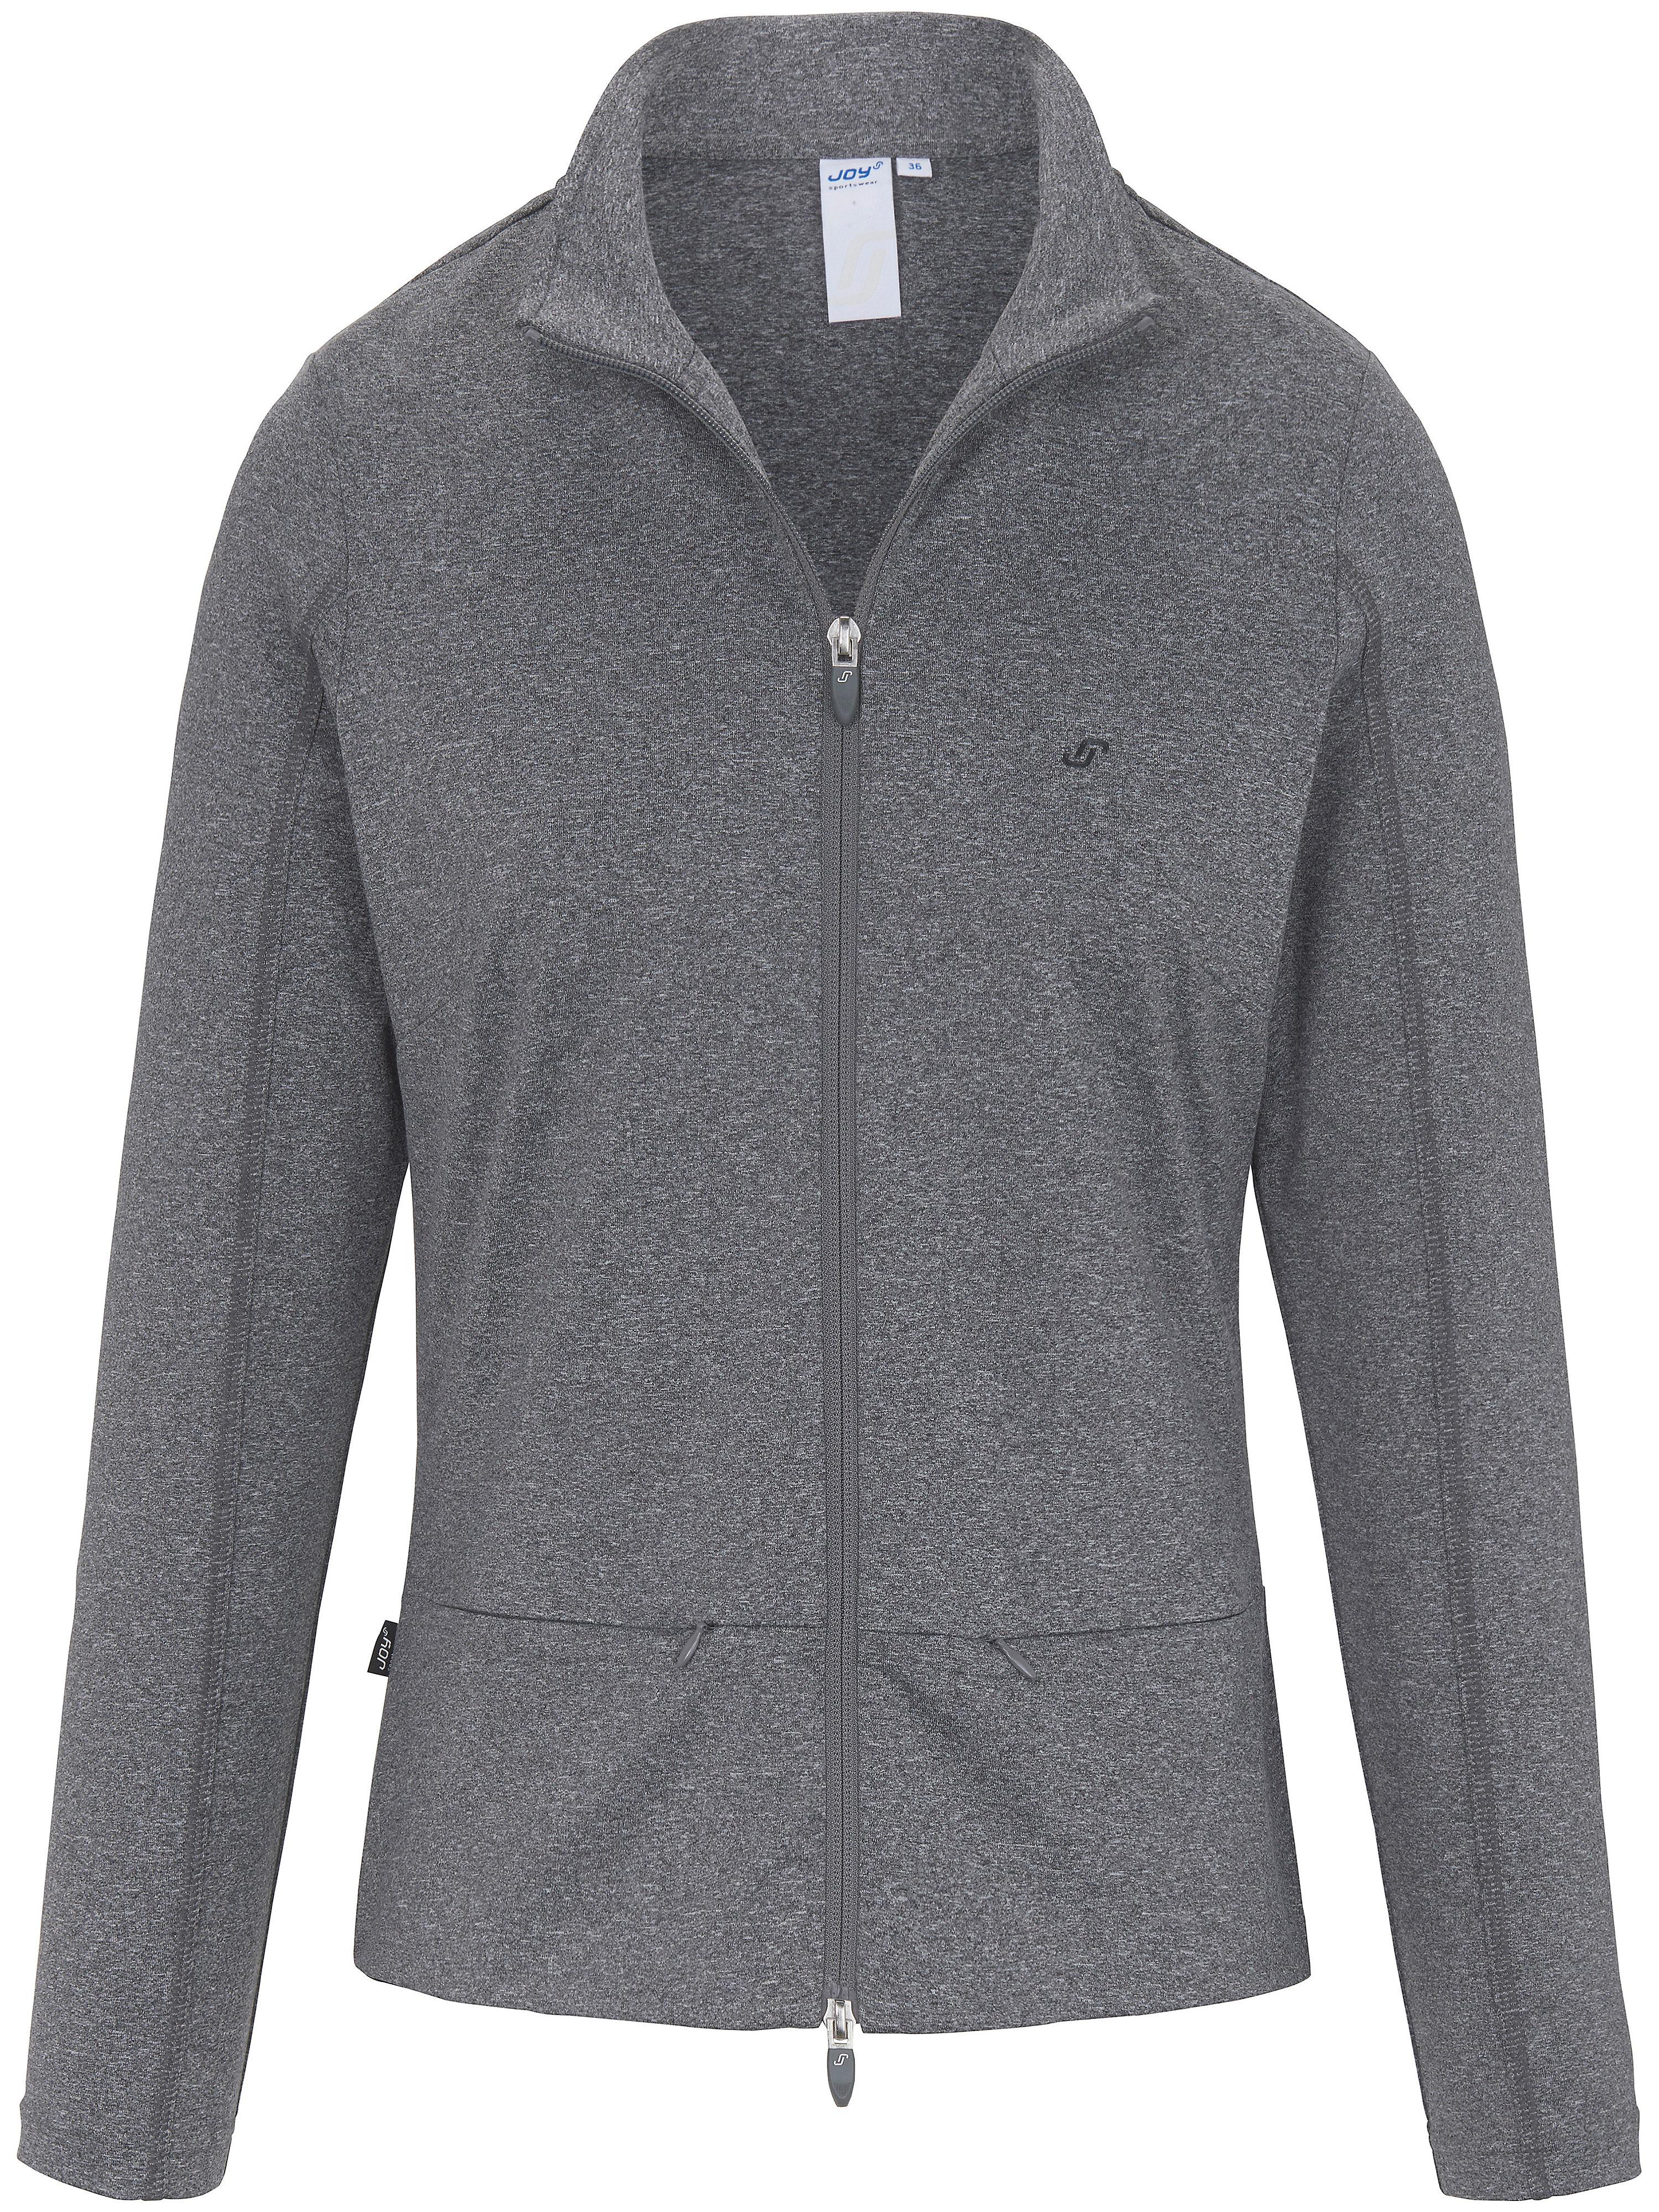 La veste  Joy gris